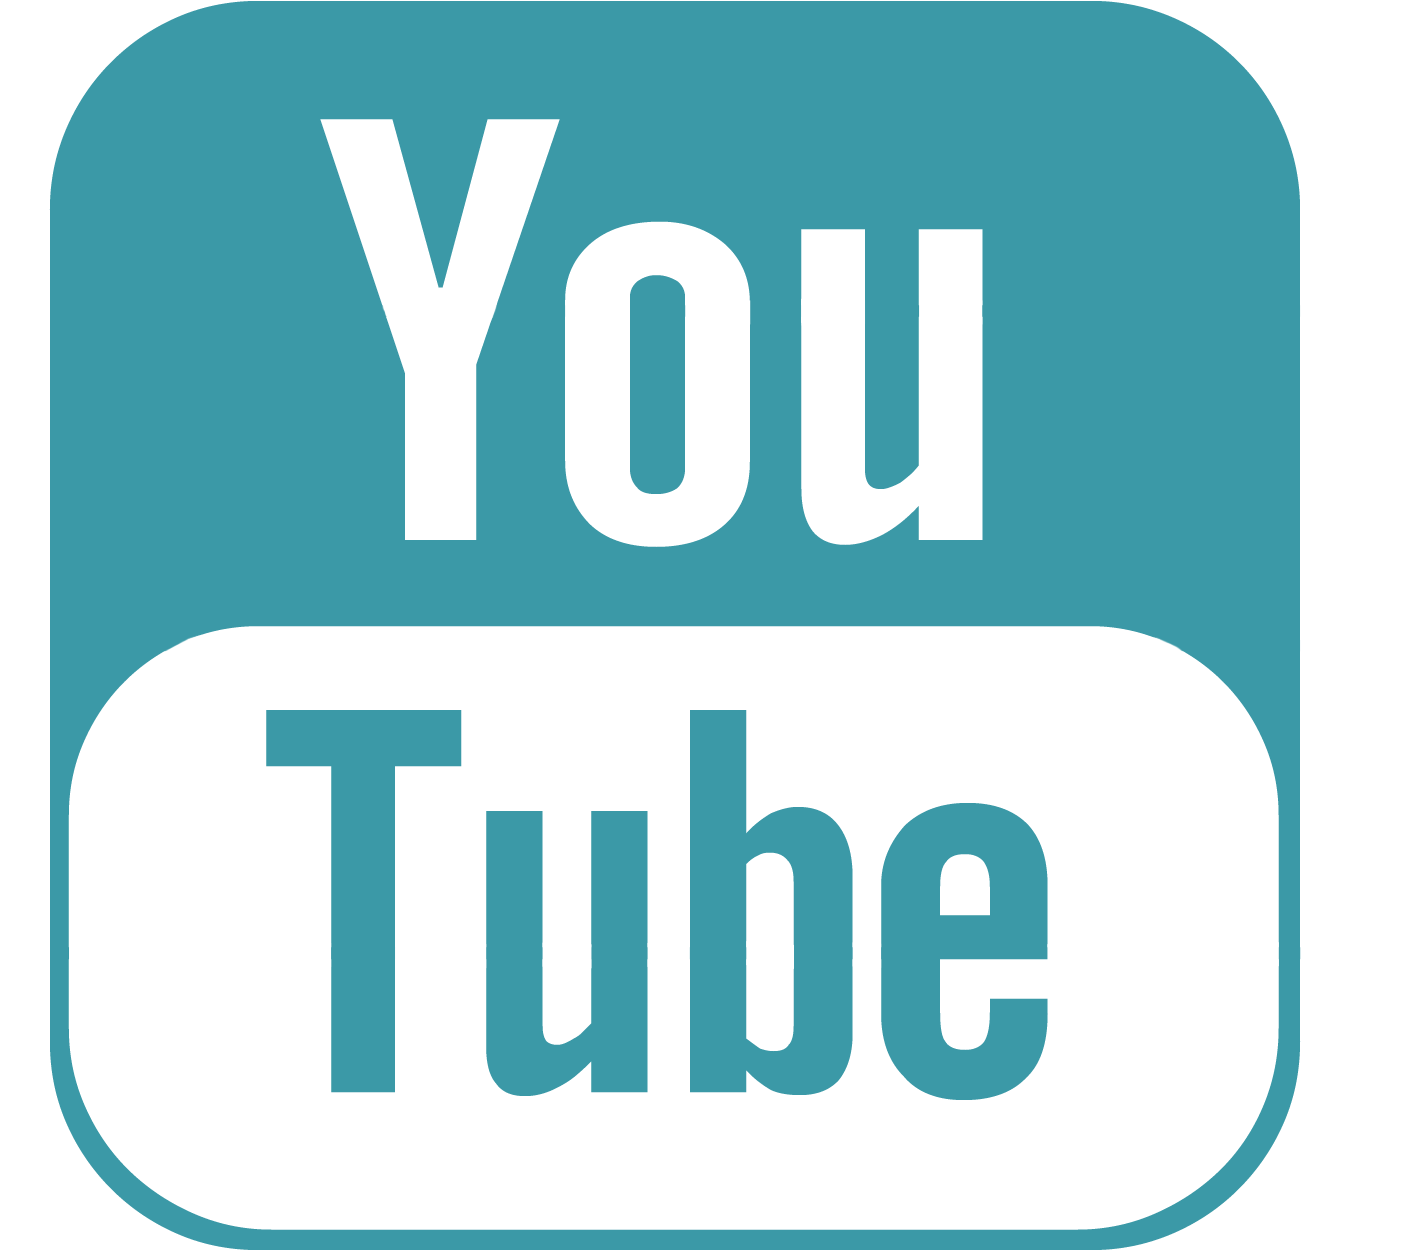 https://www.youtube.com/channel/UCkTW0ejyDGRUEGIwE0E68kQ